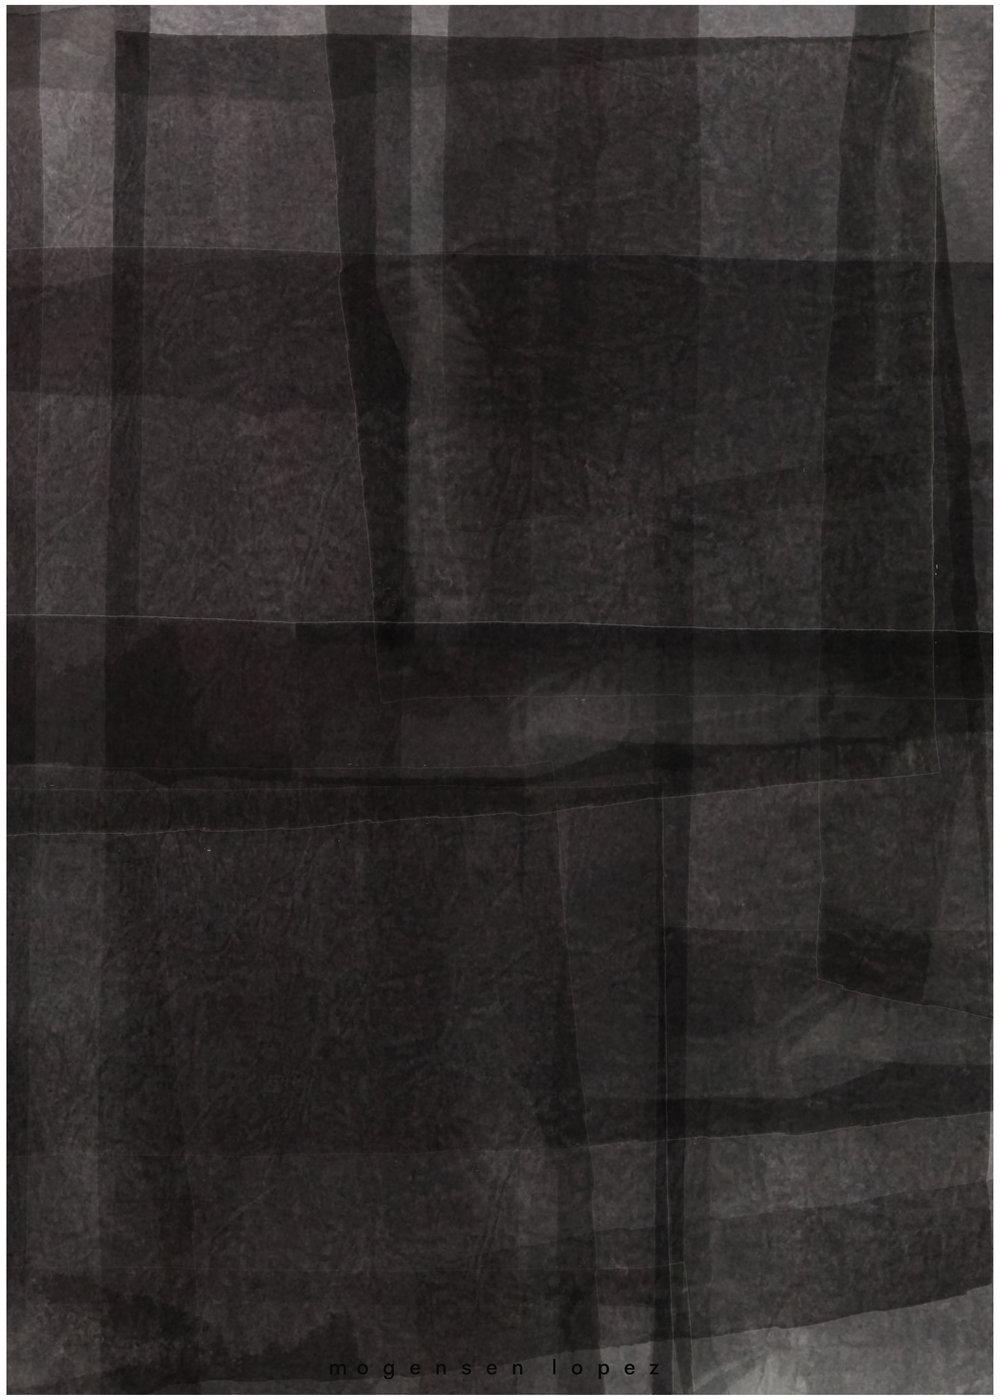 black print | Berit Mogensen Lopez